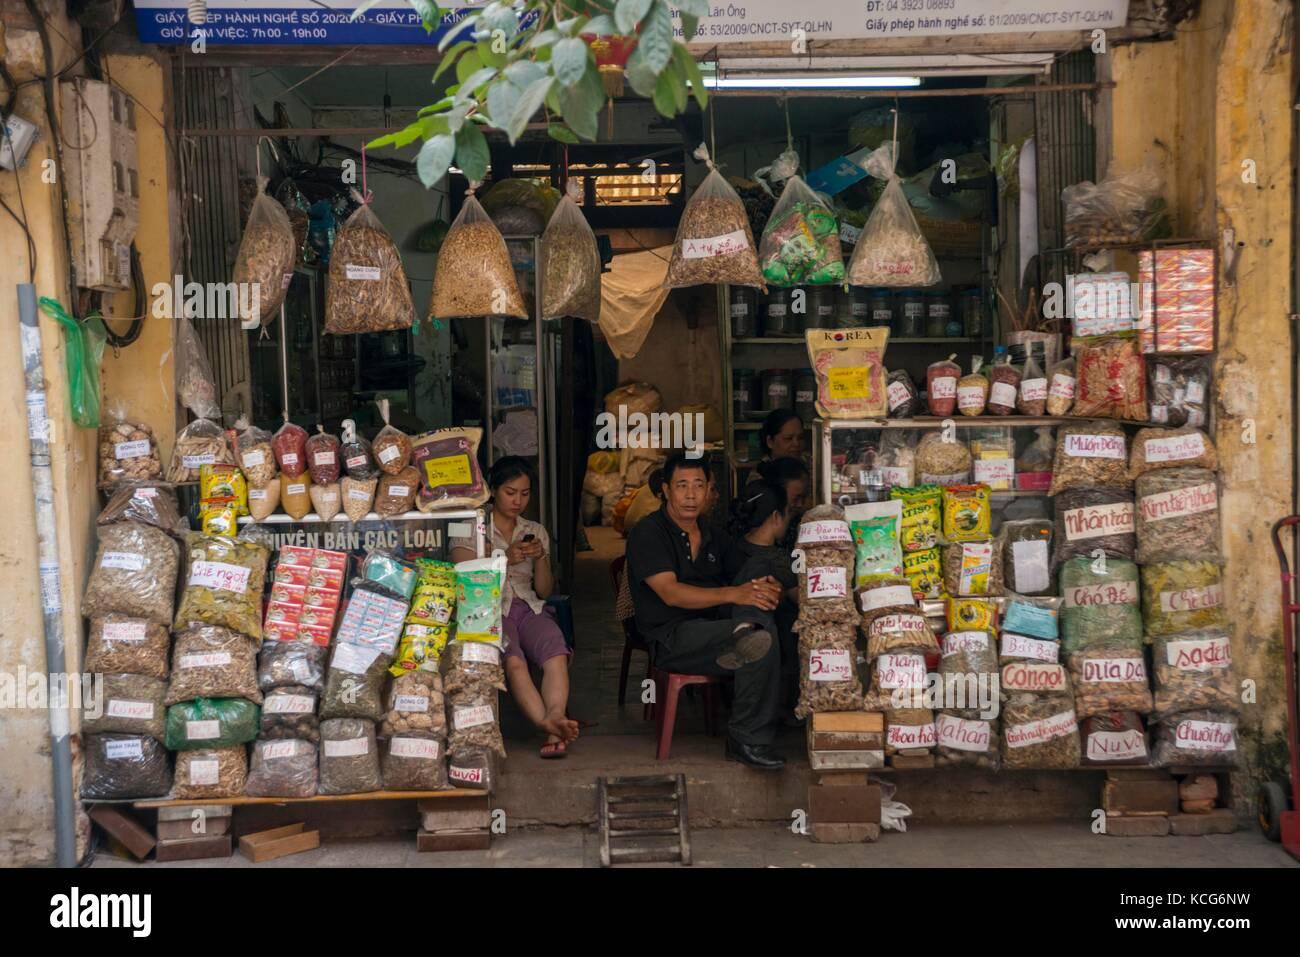 Asien Lifestyle hanoi asien lifestyle reise landschaft reise erlebnis